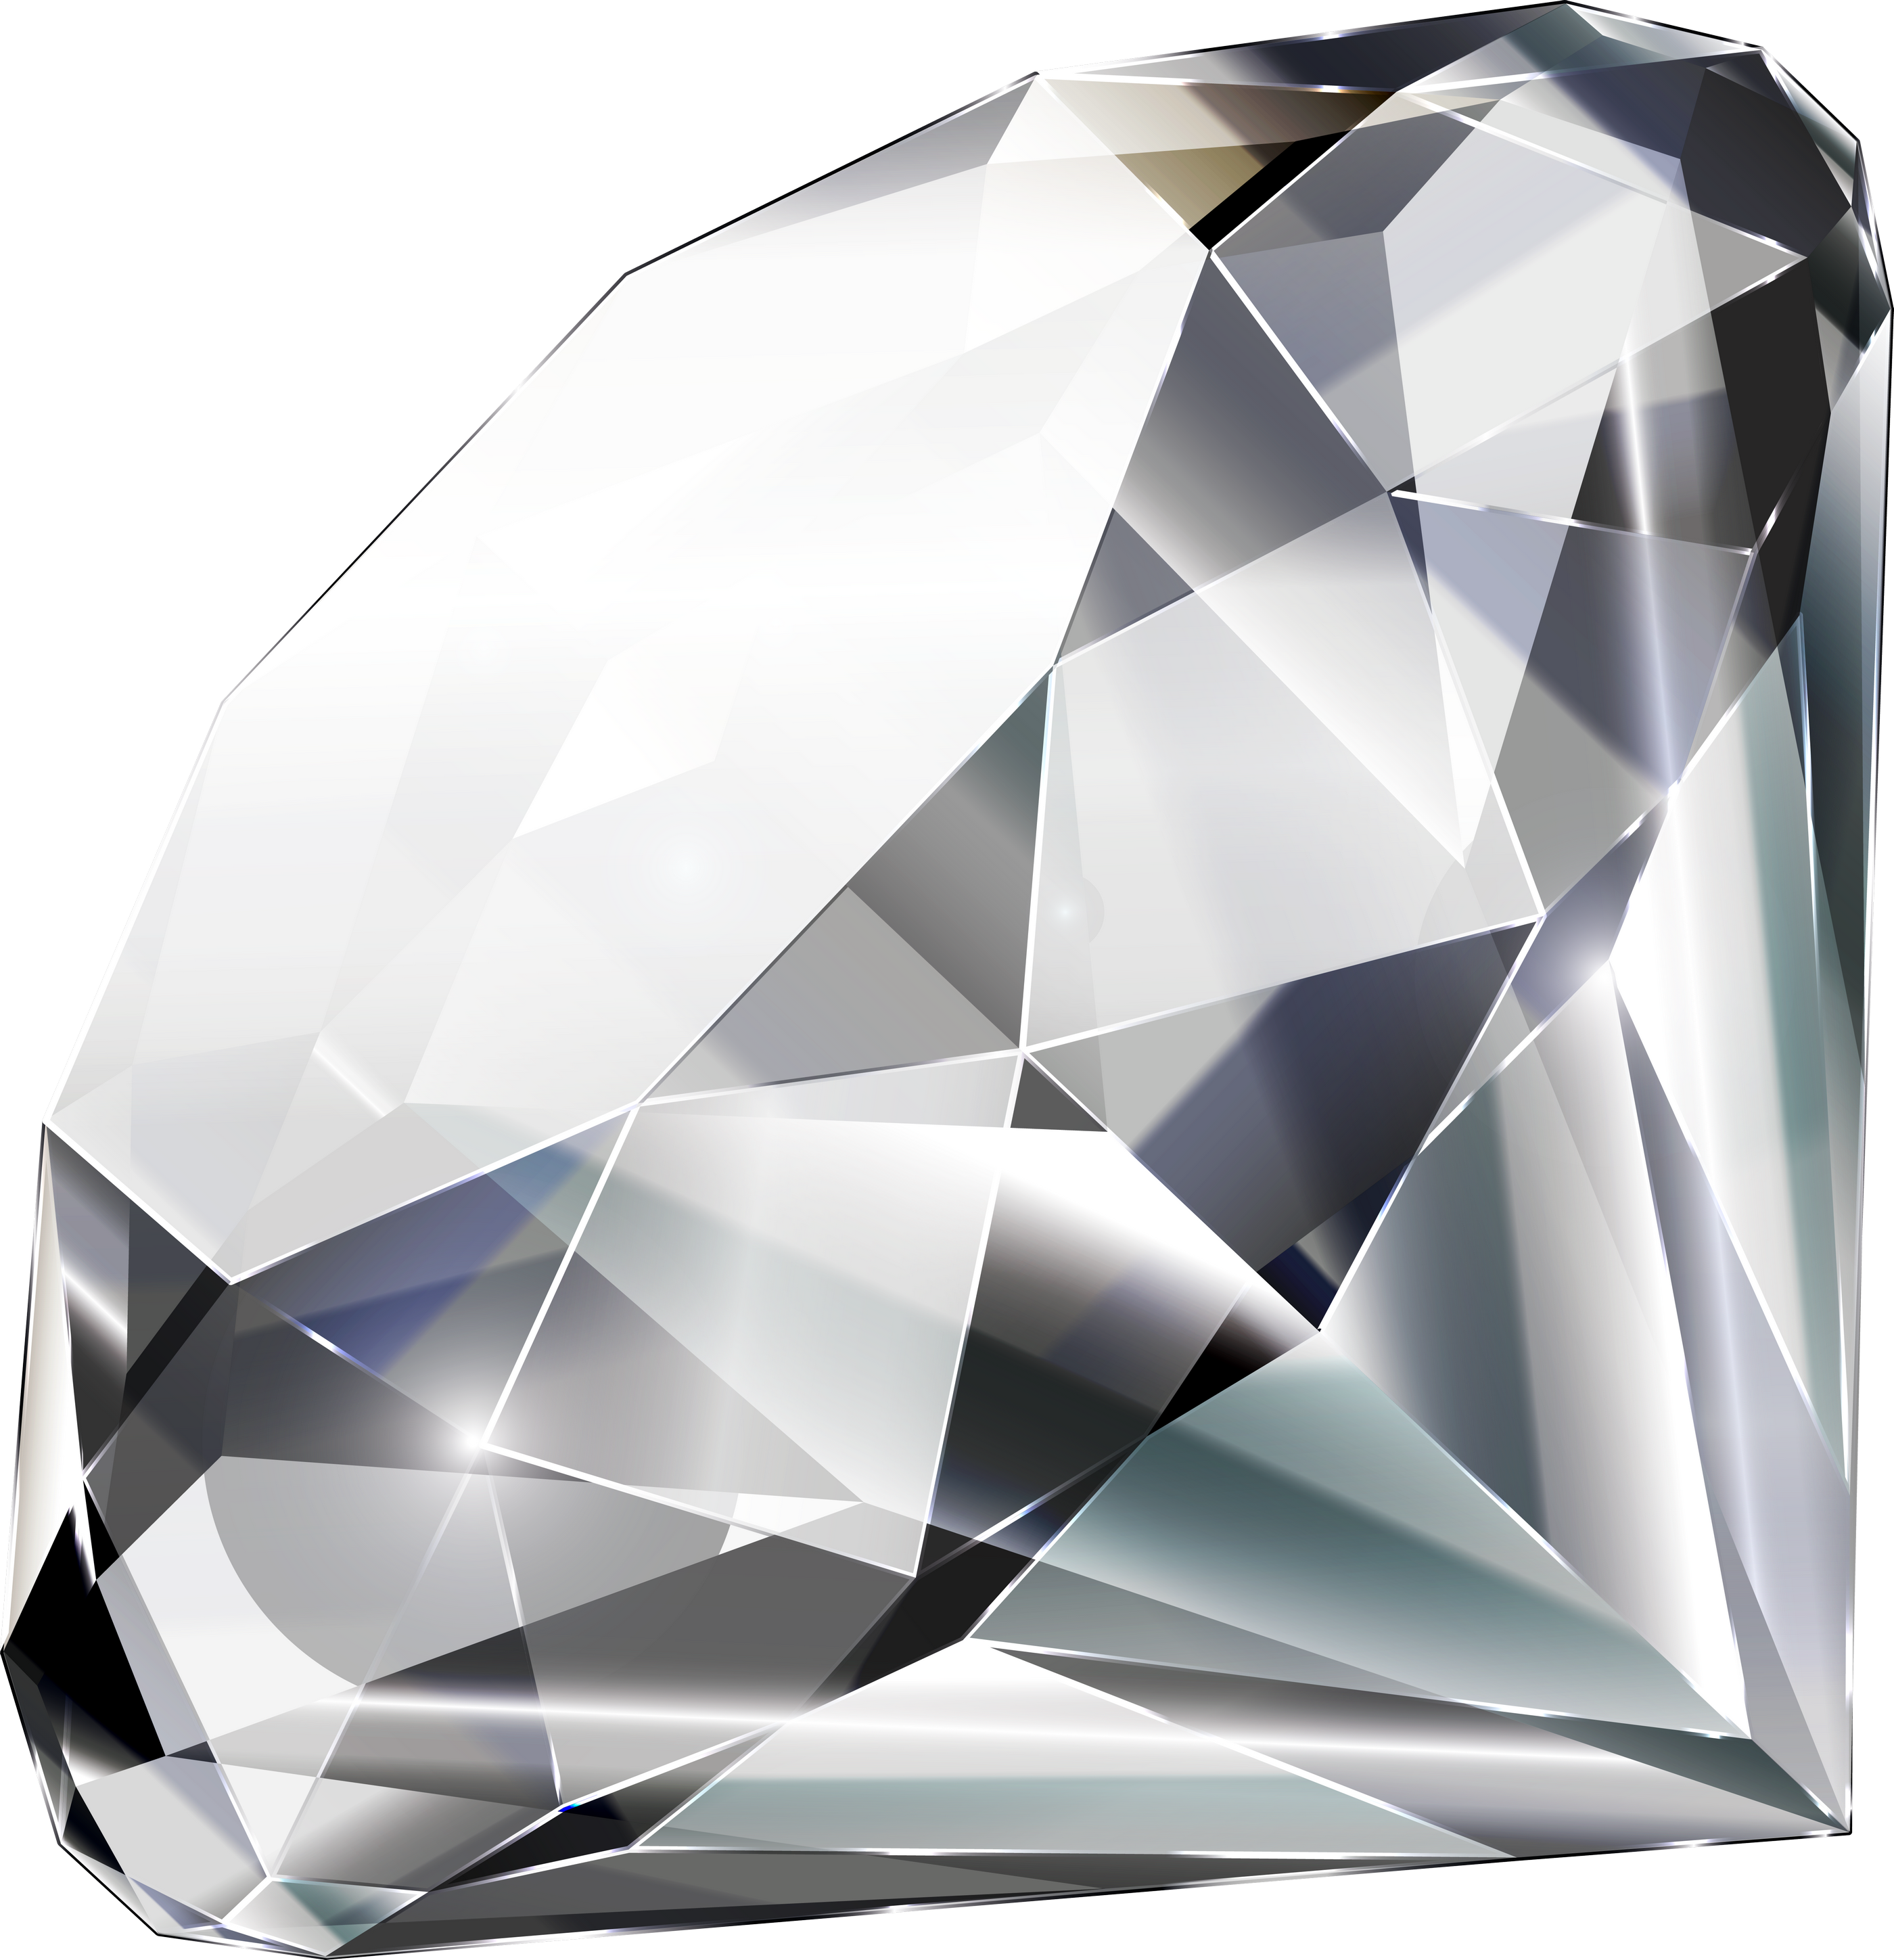 Brilliant Diamond Png Image Diamond Drawing Diamond Wallpaper Diamond Wallpaper Iphone